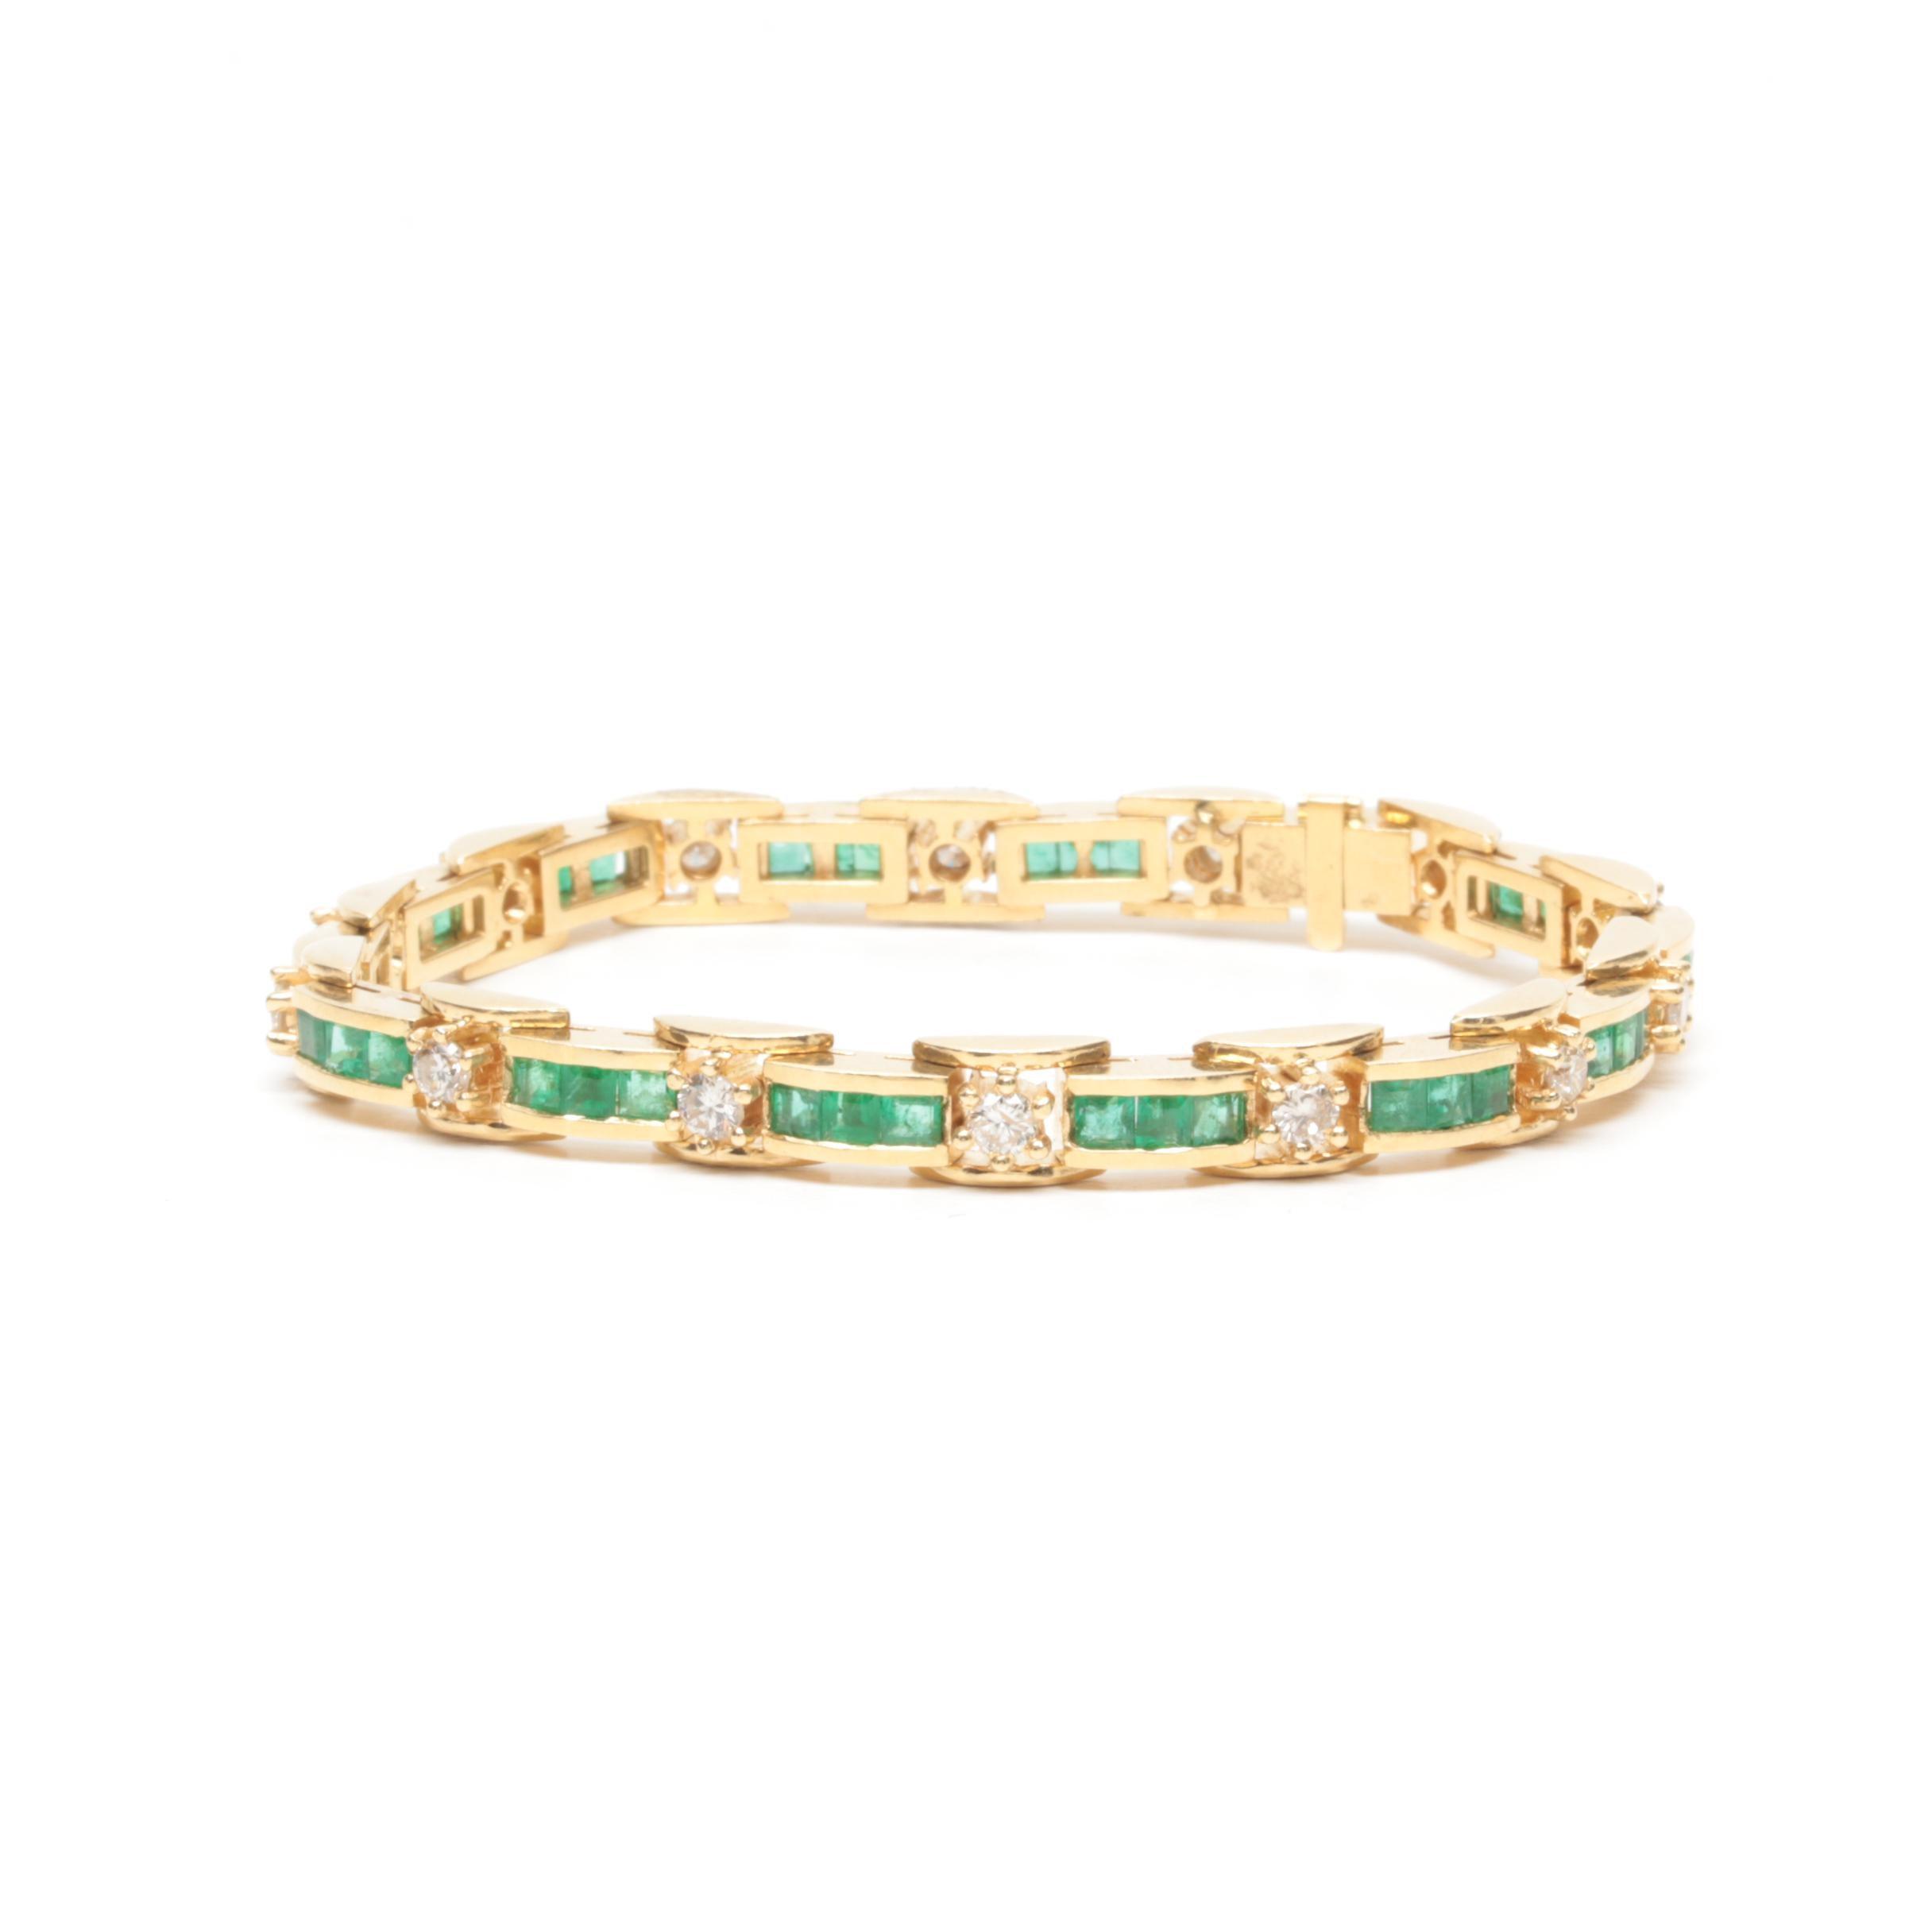 18K Yellow Gold Emerald and 1.40 CTW Diamond Tennis Bracelet